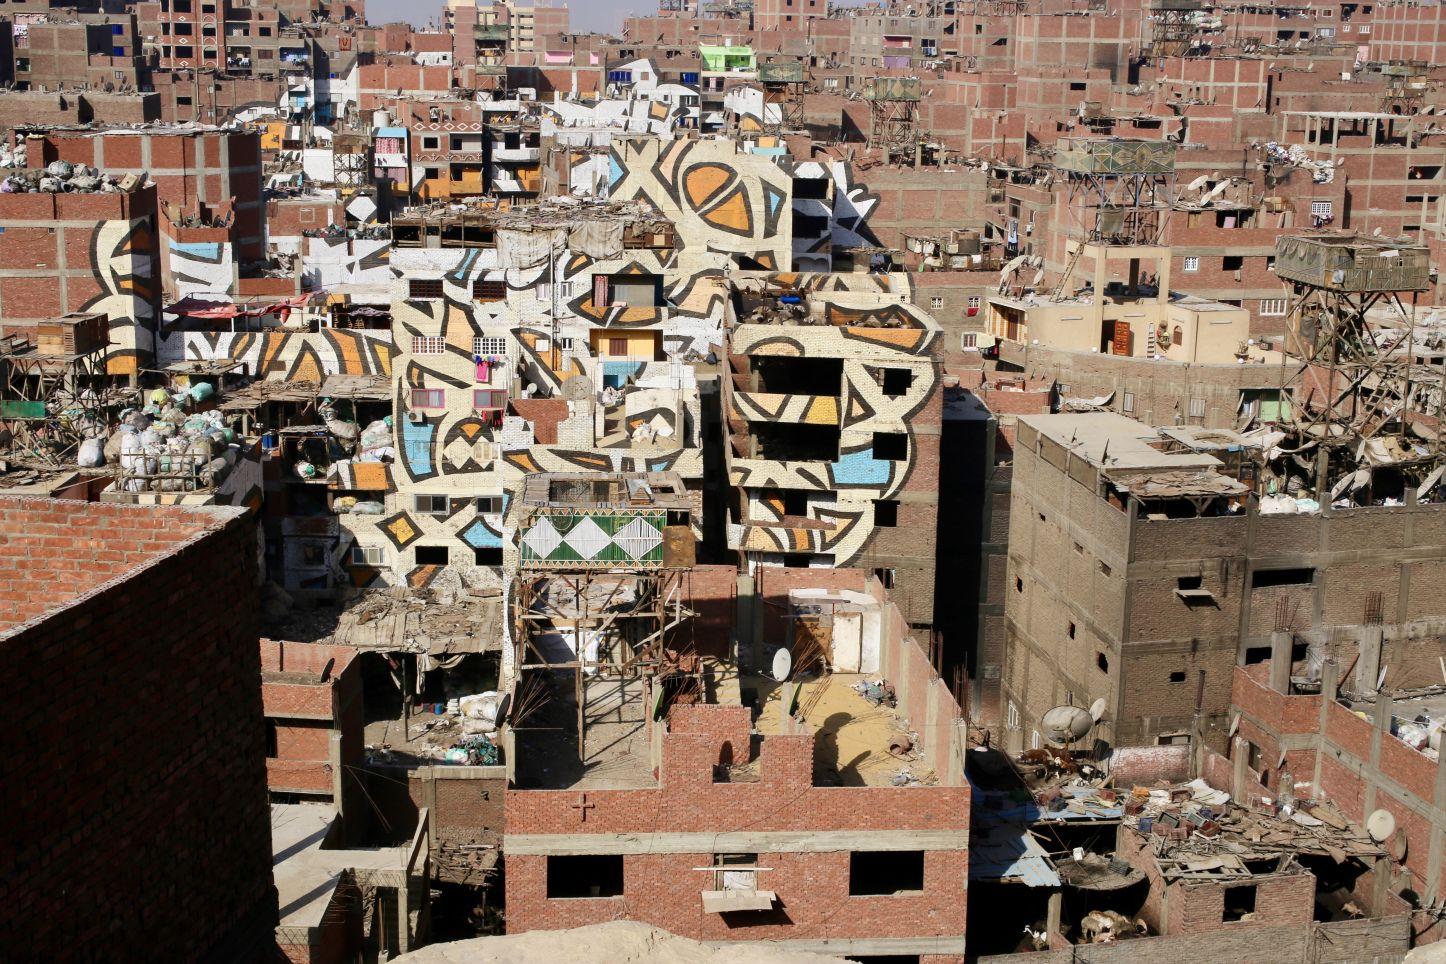 Garbage City Cairo Cairo City Africa Bucket List